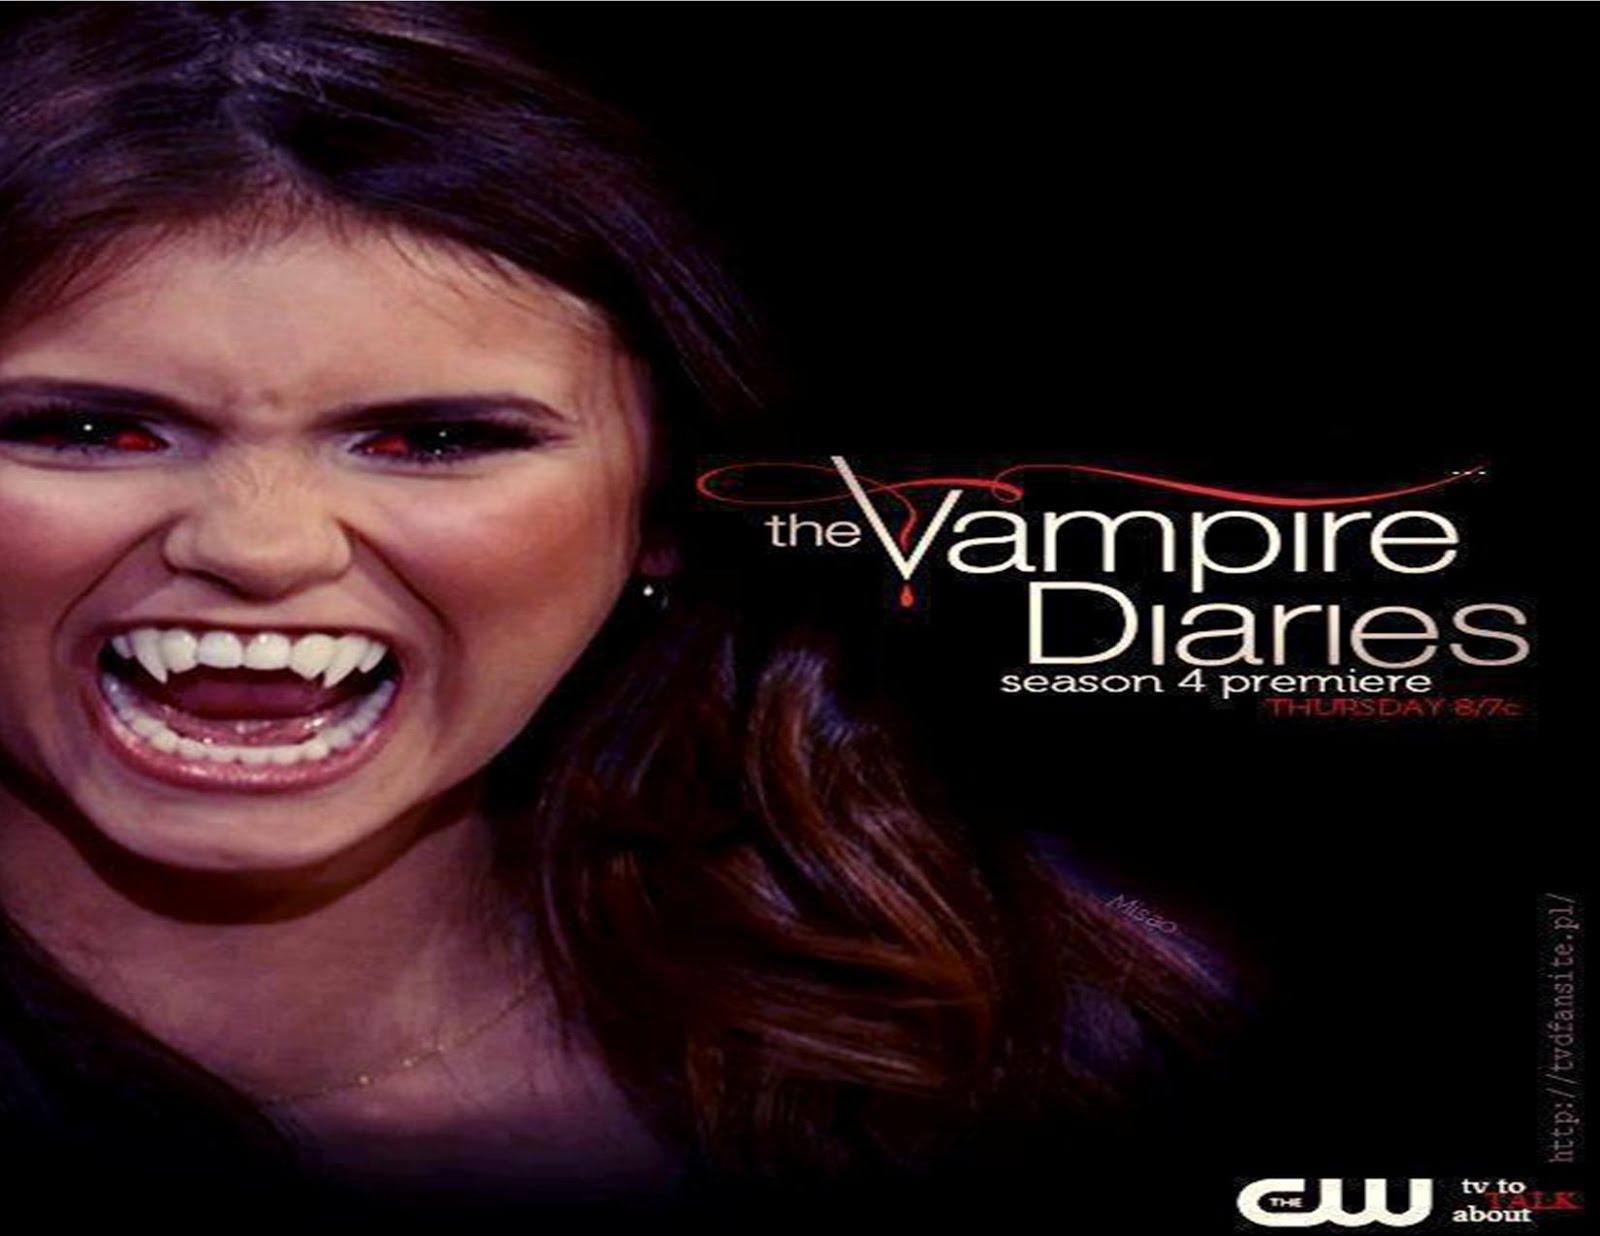 http://3.bp.blogspot.com/-Zksta9ZqCs8/UJJLlbPxxpI/AAAAAAAAARA/roli2RFz9cE/s1600/vampire%2Bdiaries.jpg